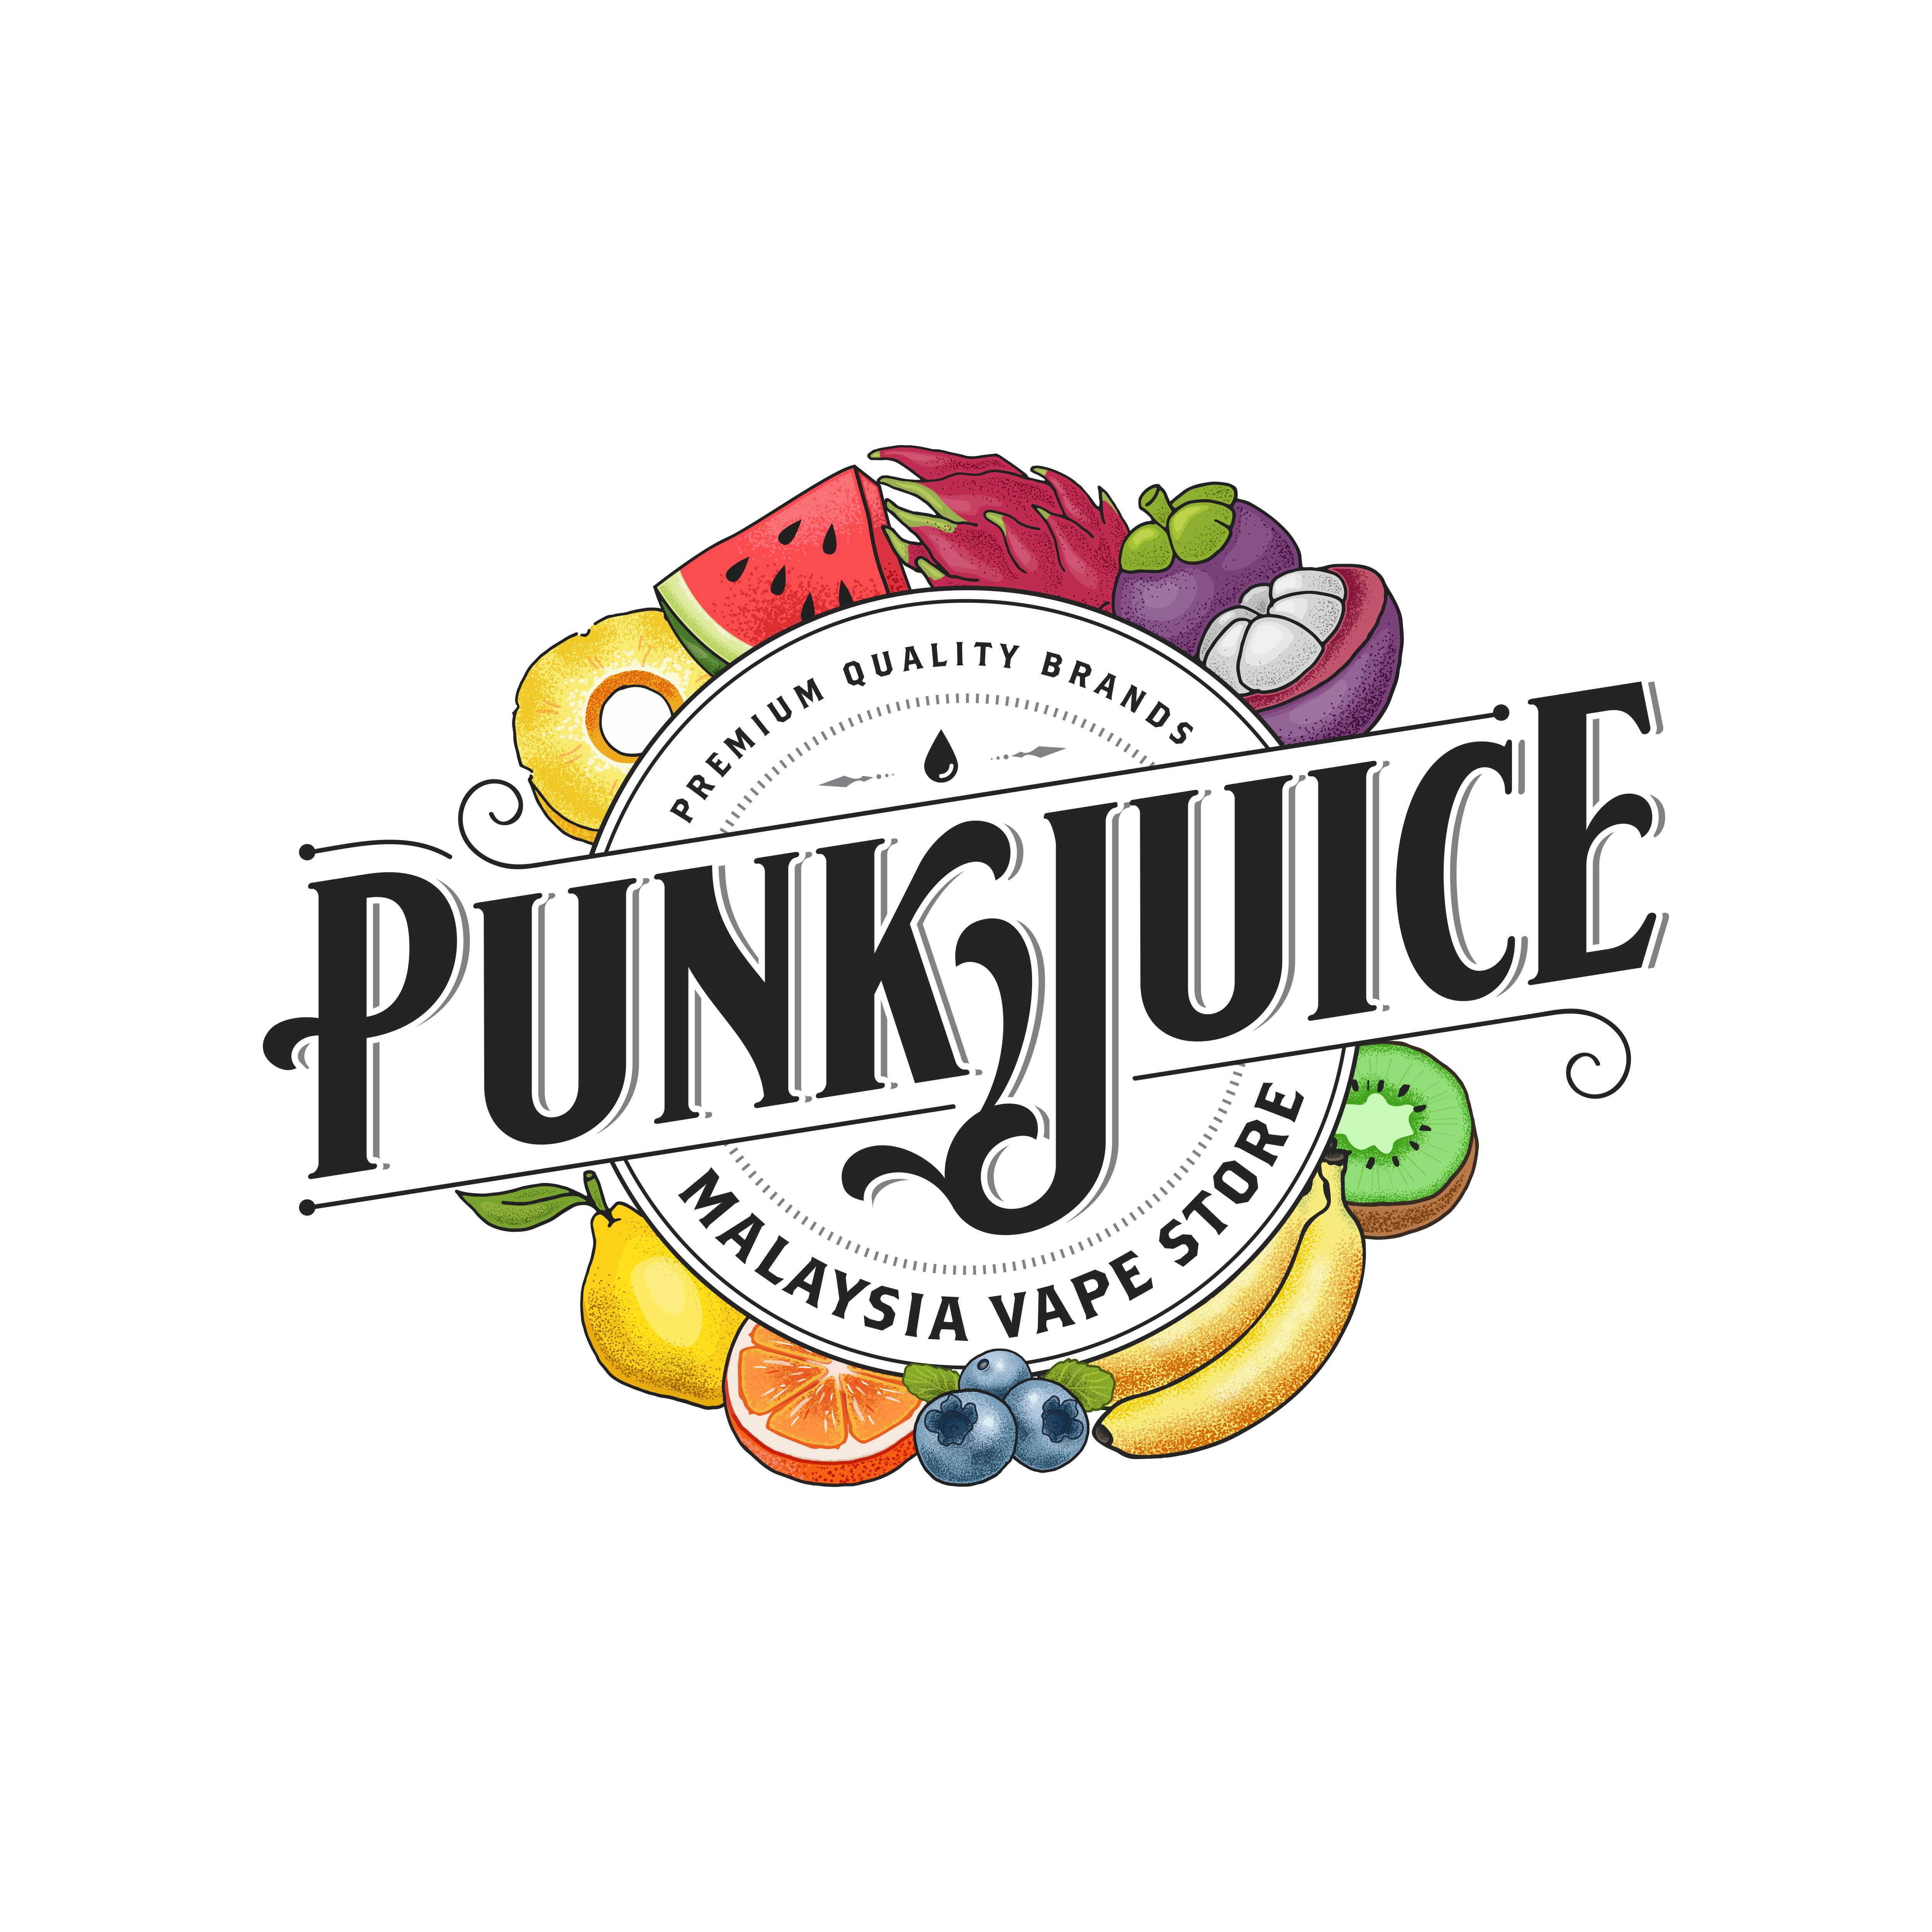 Logo for Punkjuice, a website selling Malaysian made eliquids (NO THC OR CBD)